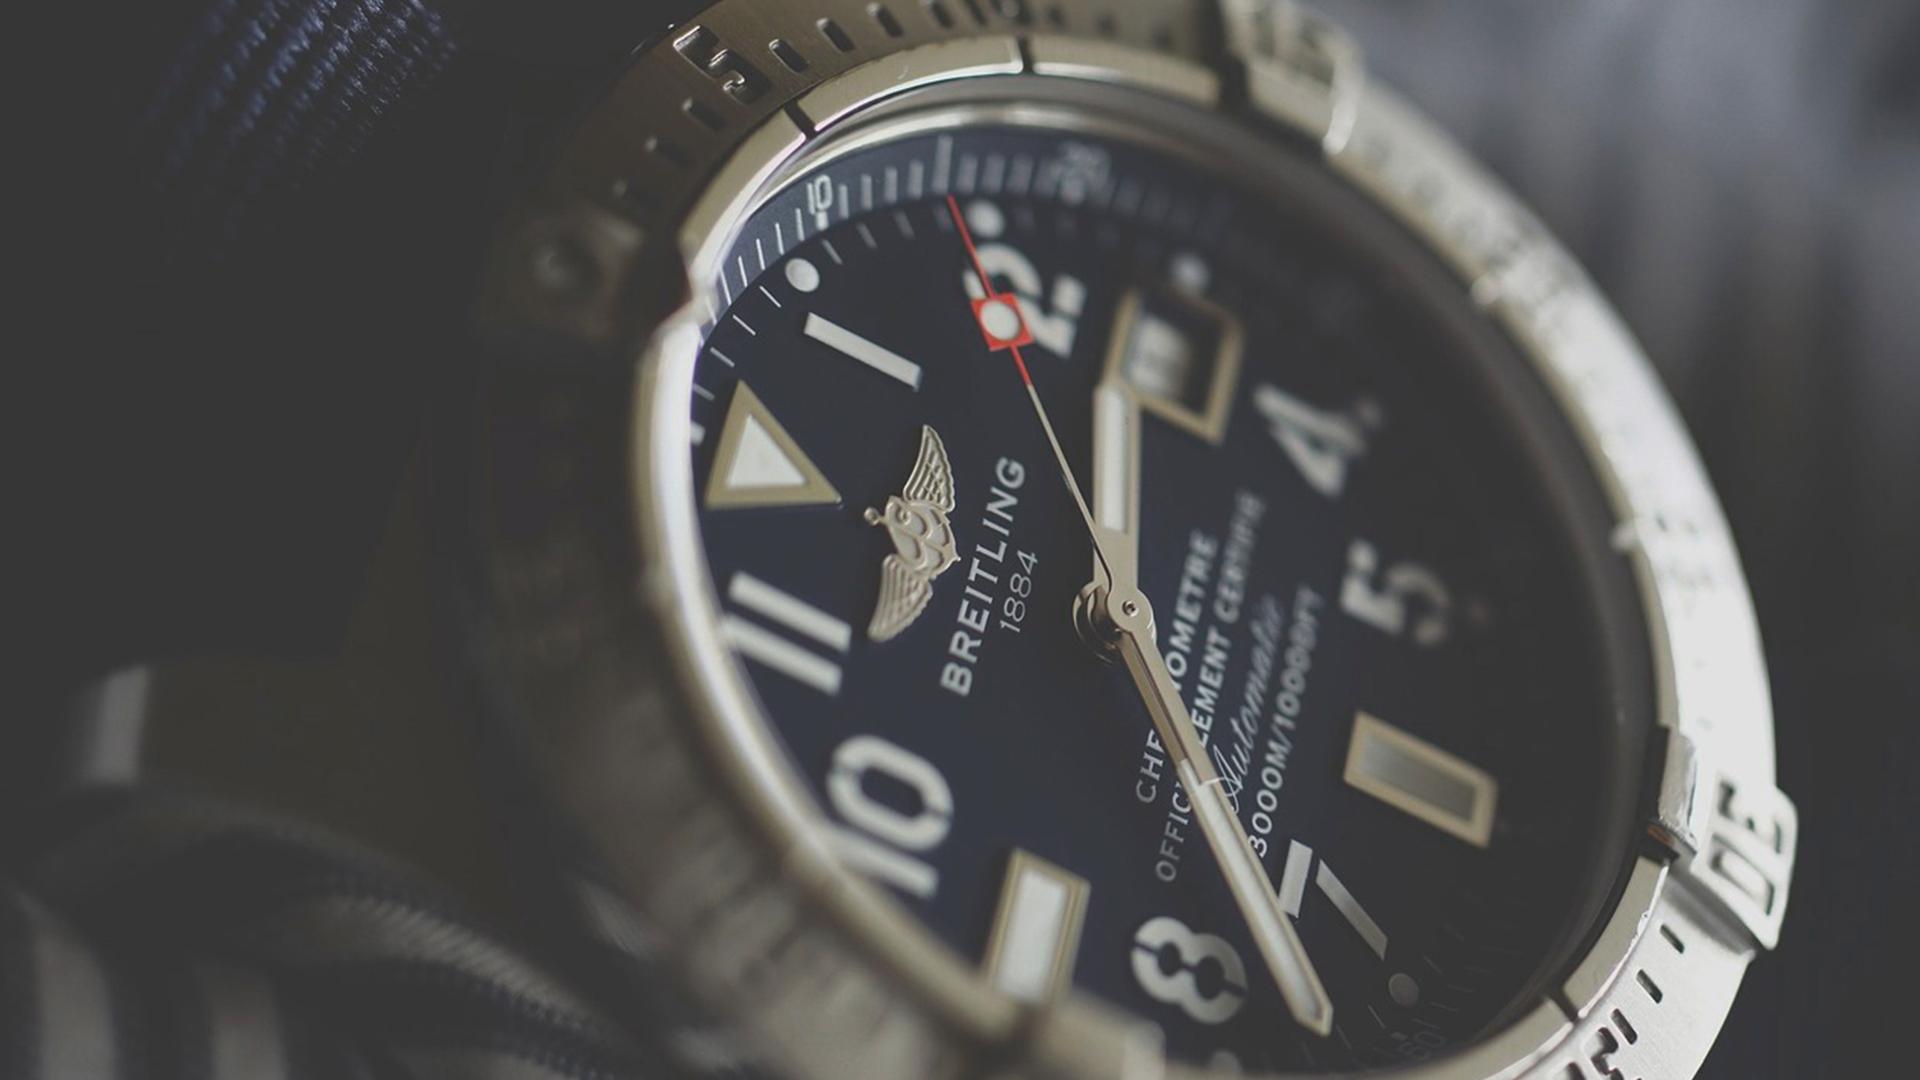 List of top wrist watch brands in America